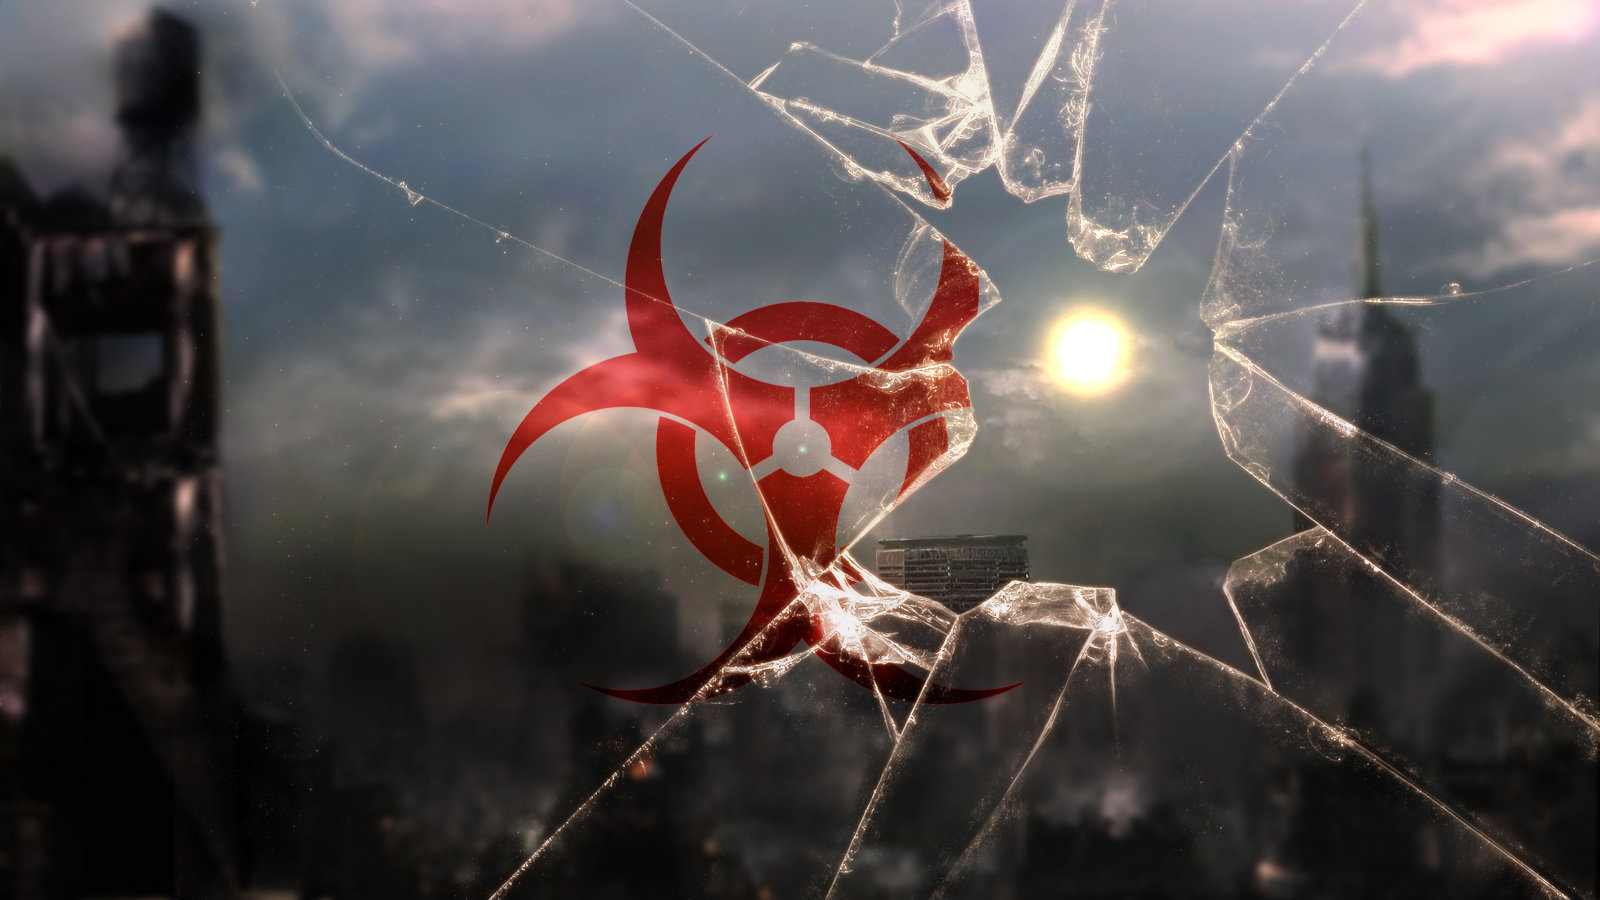 Download Biohazard Wallpaper 1600x900 Wallpoper 329785 1600x900